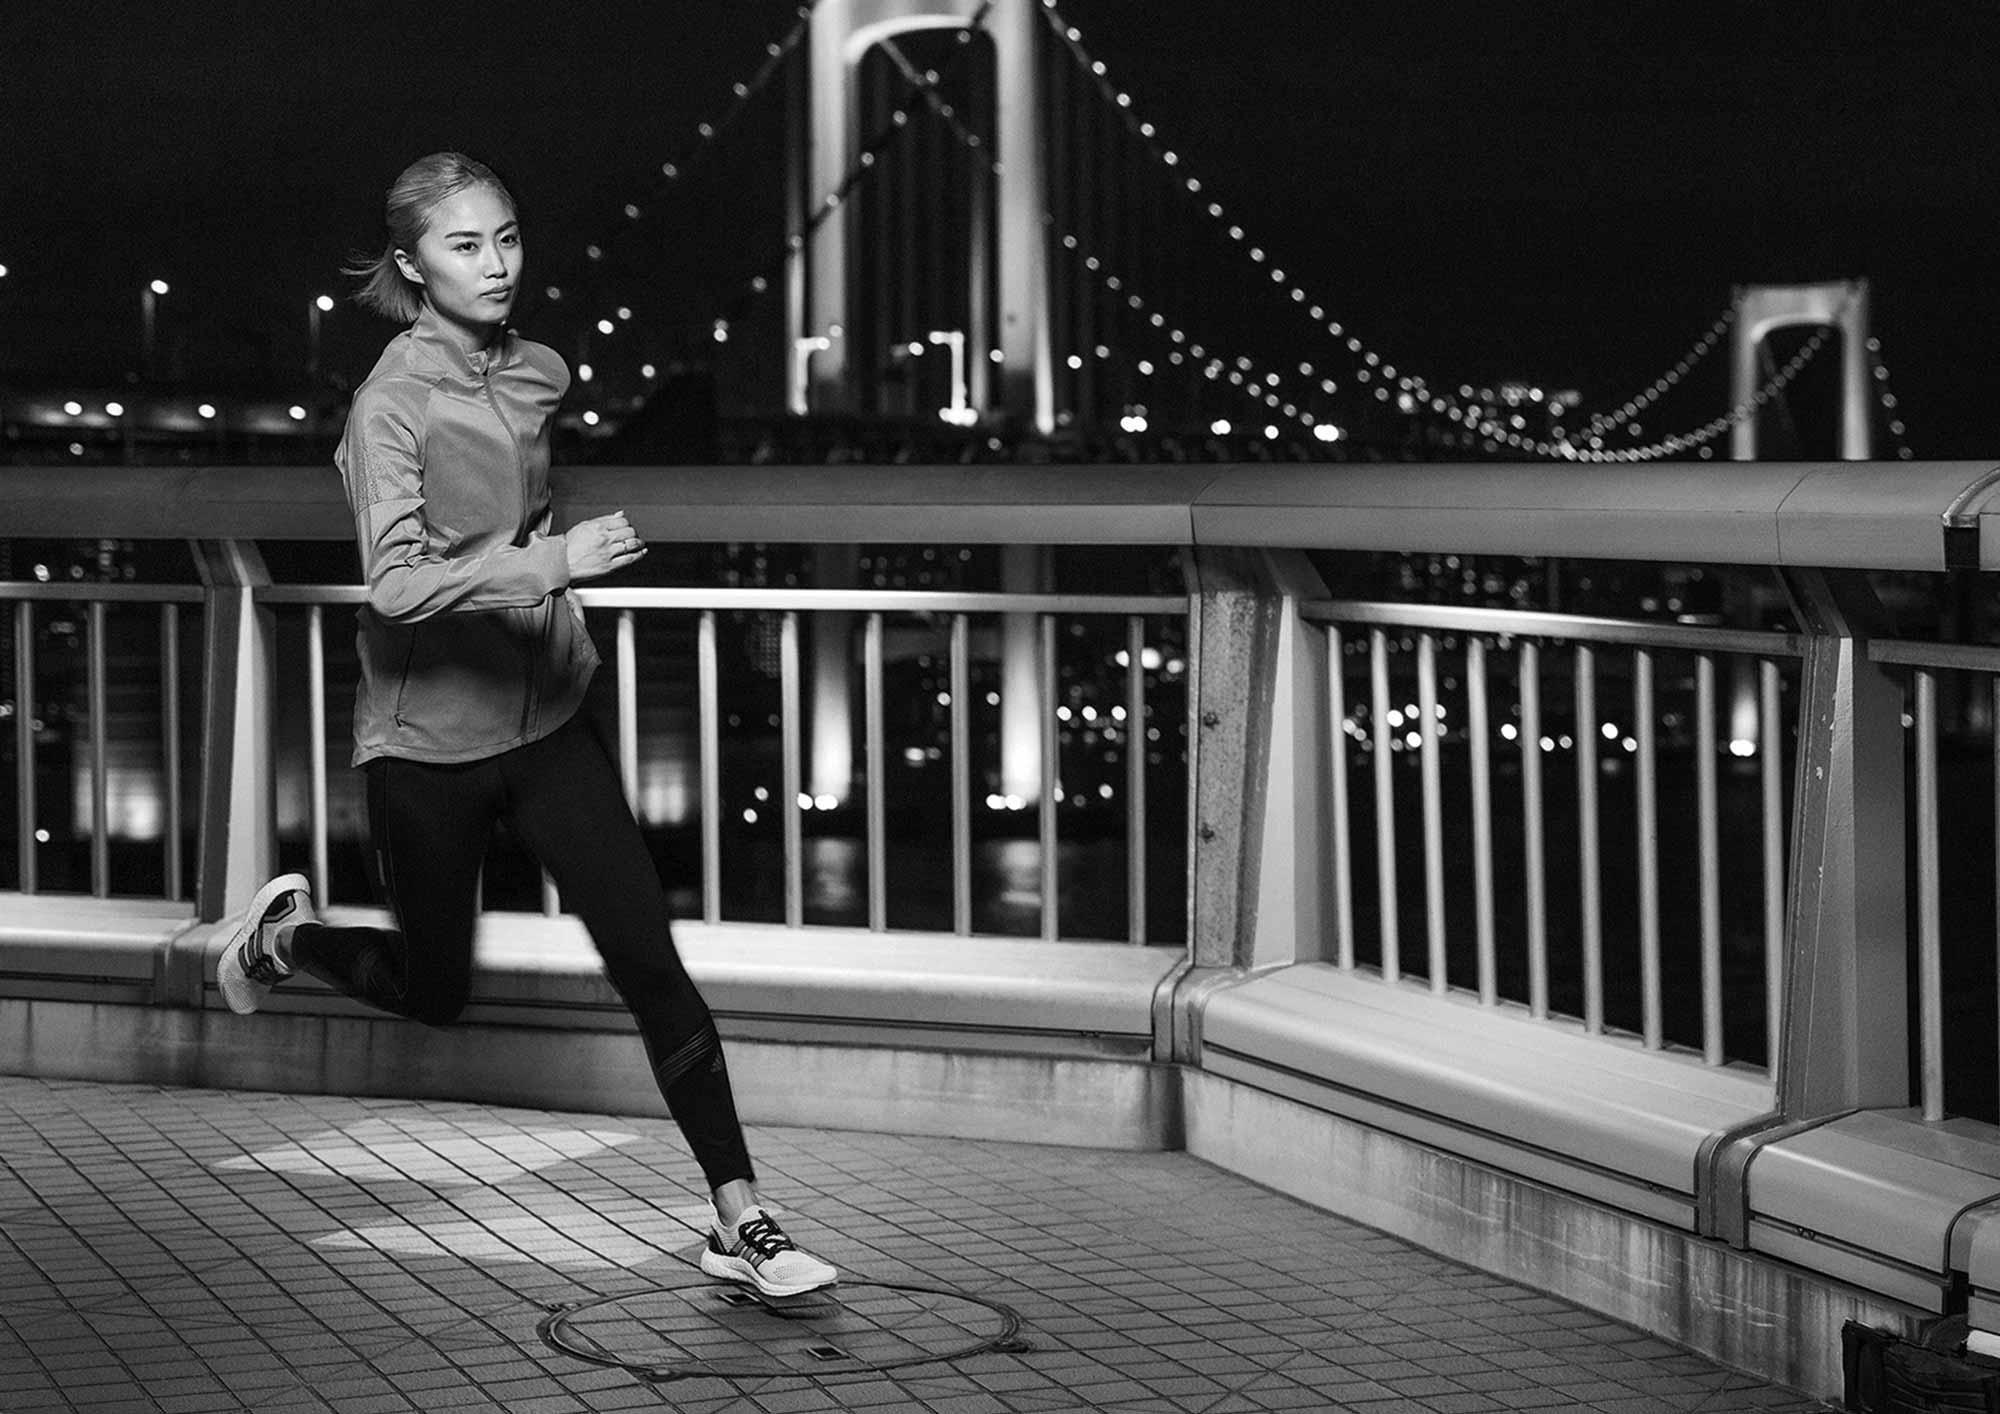 Adidas Speedfactory AM4TKY (Runner)